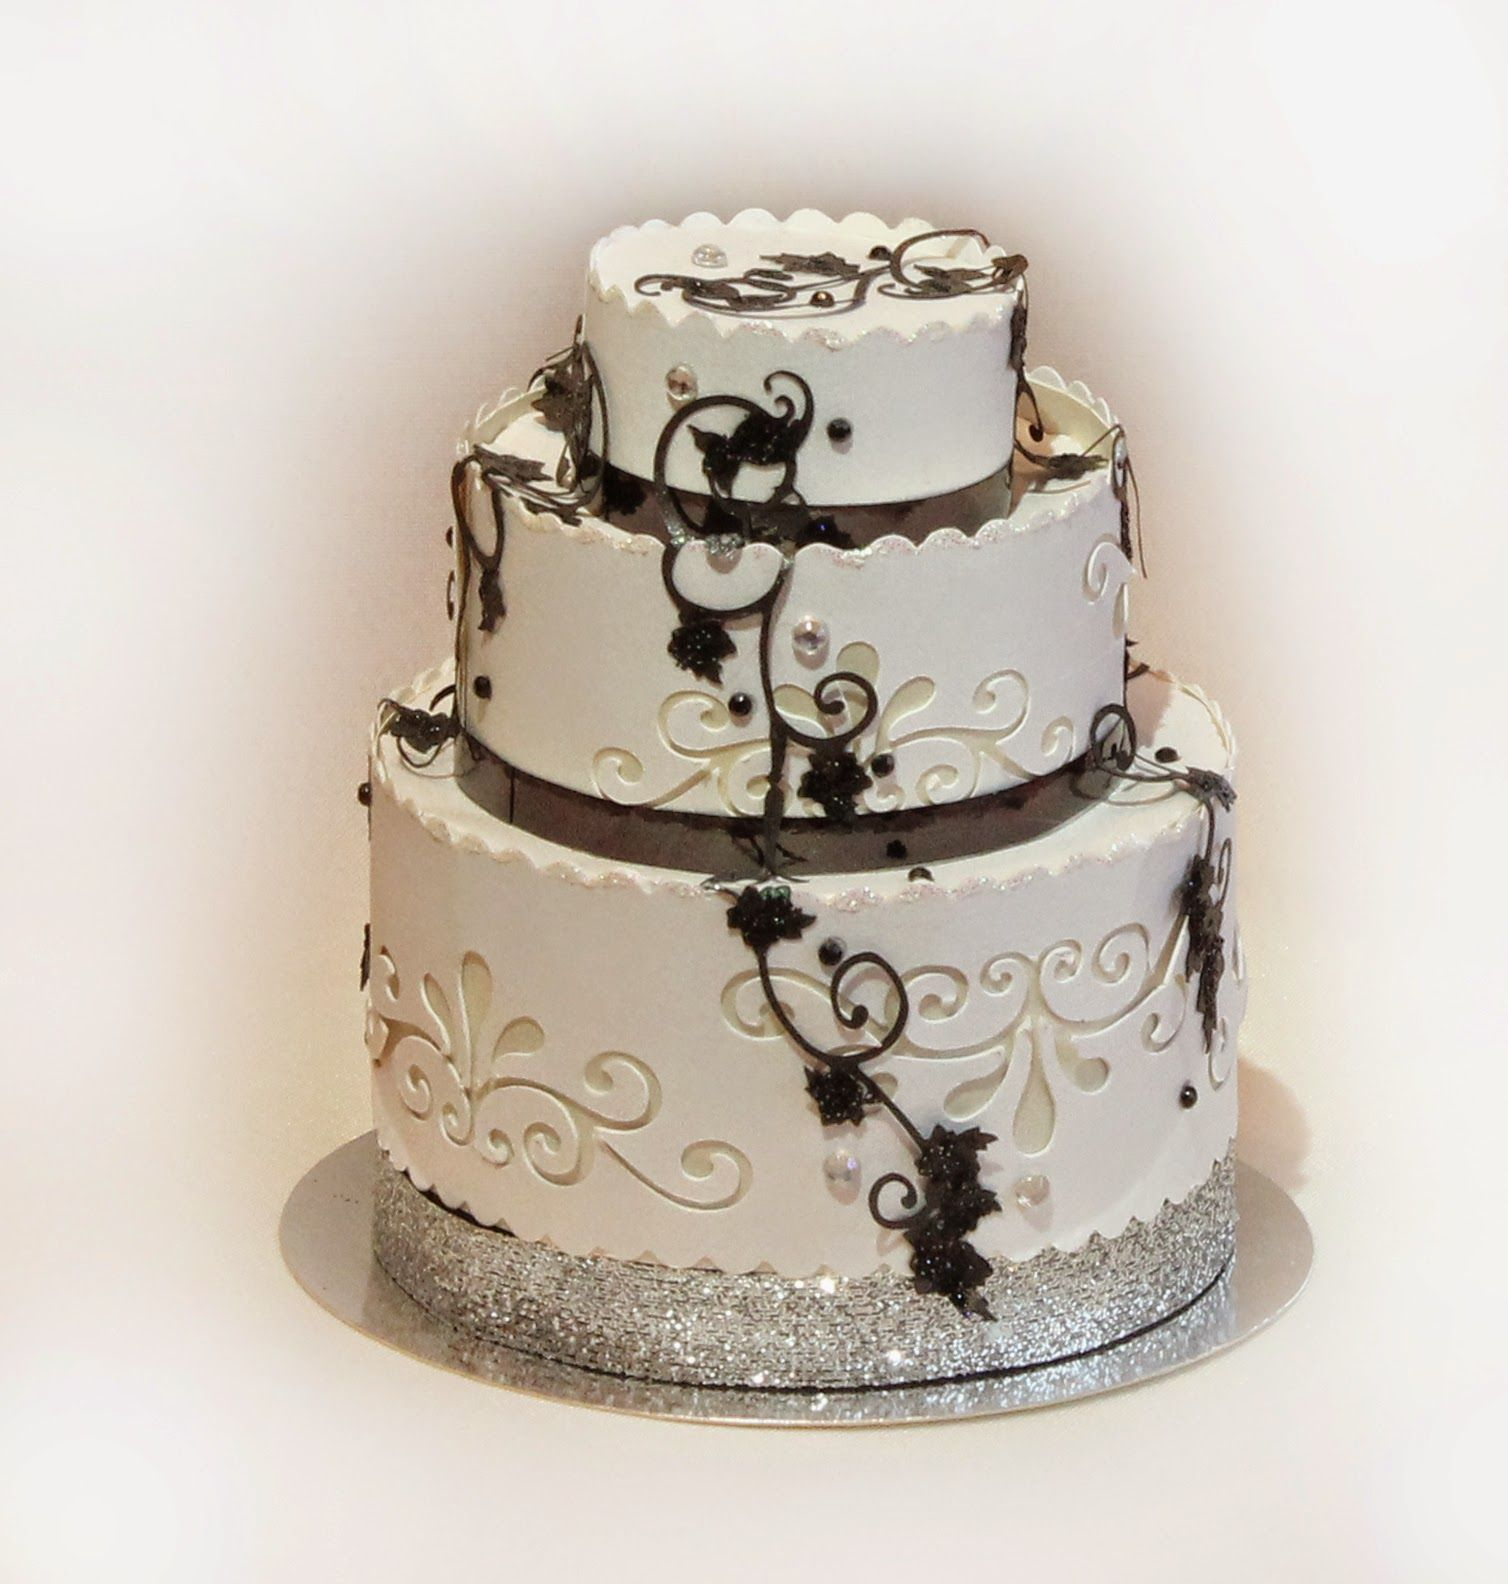 3 Tier wedding cake favor | Cricut Projects | Pinterest | Tier ...